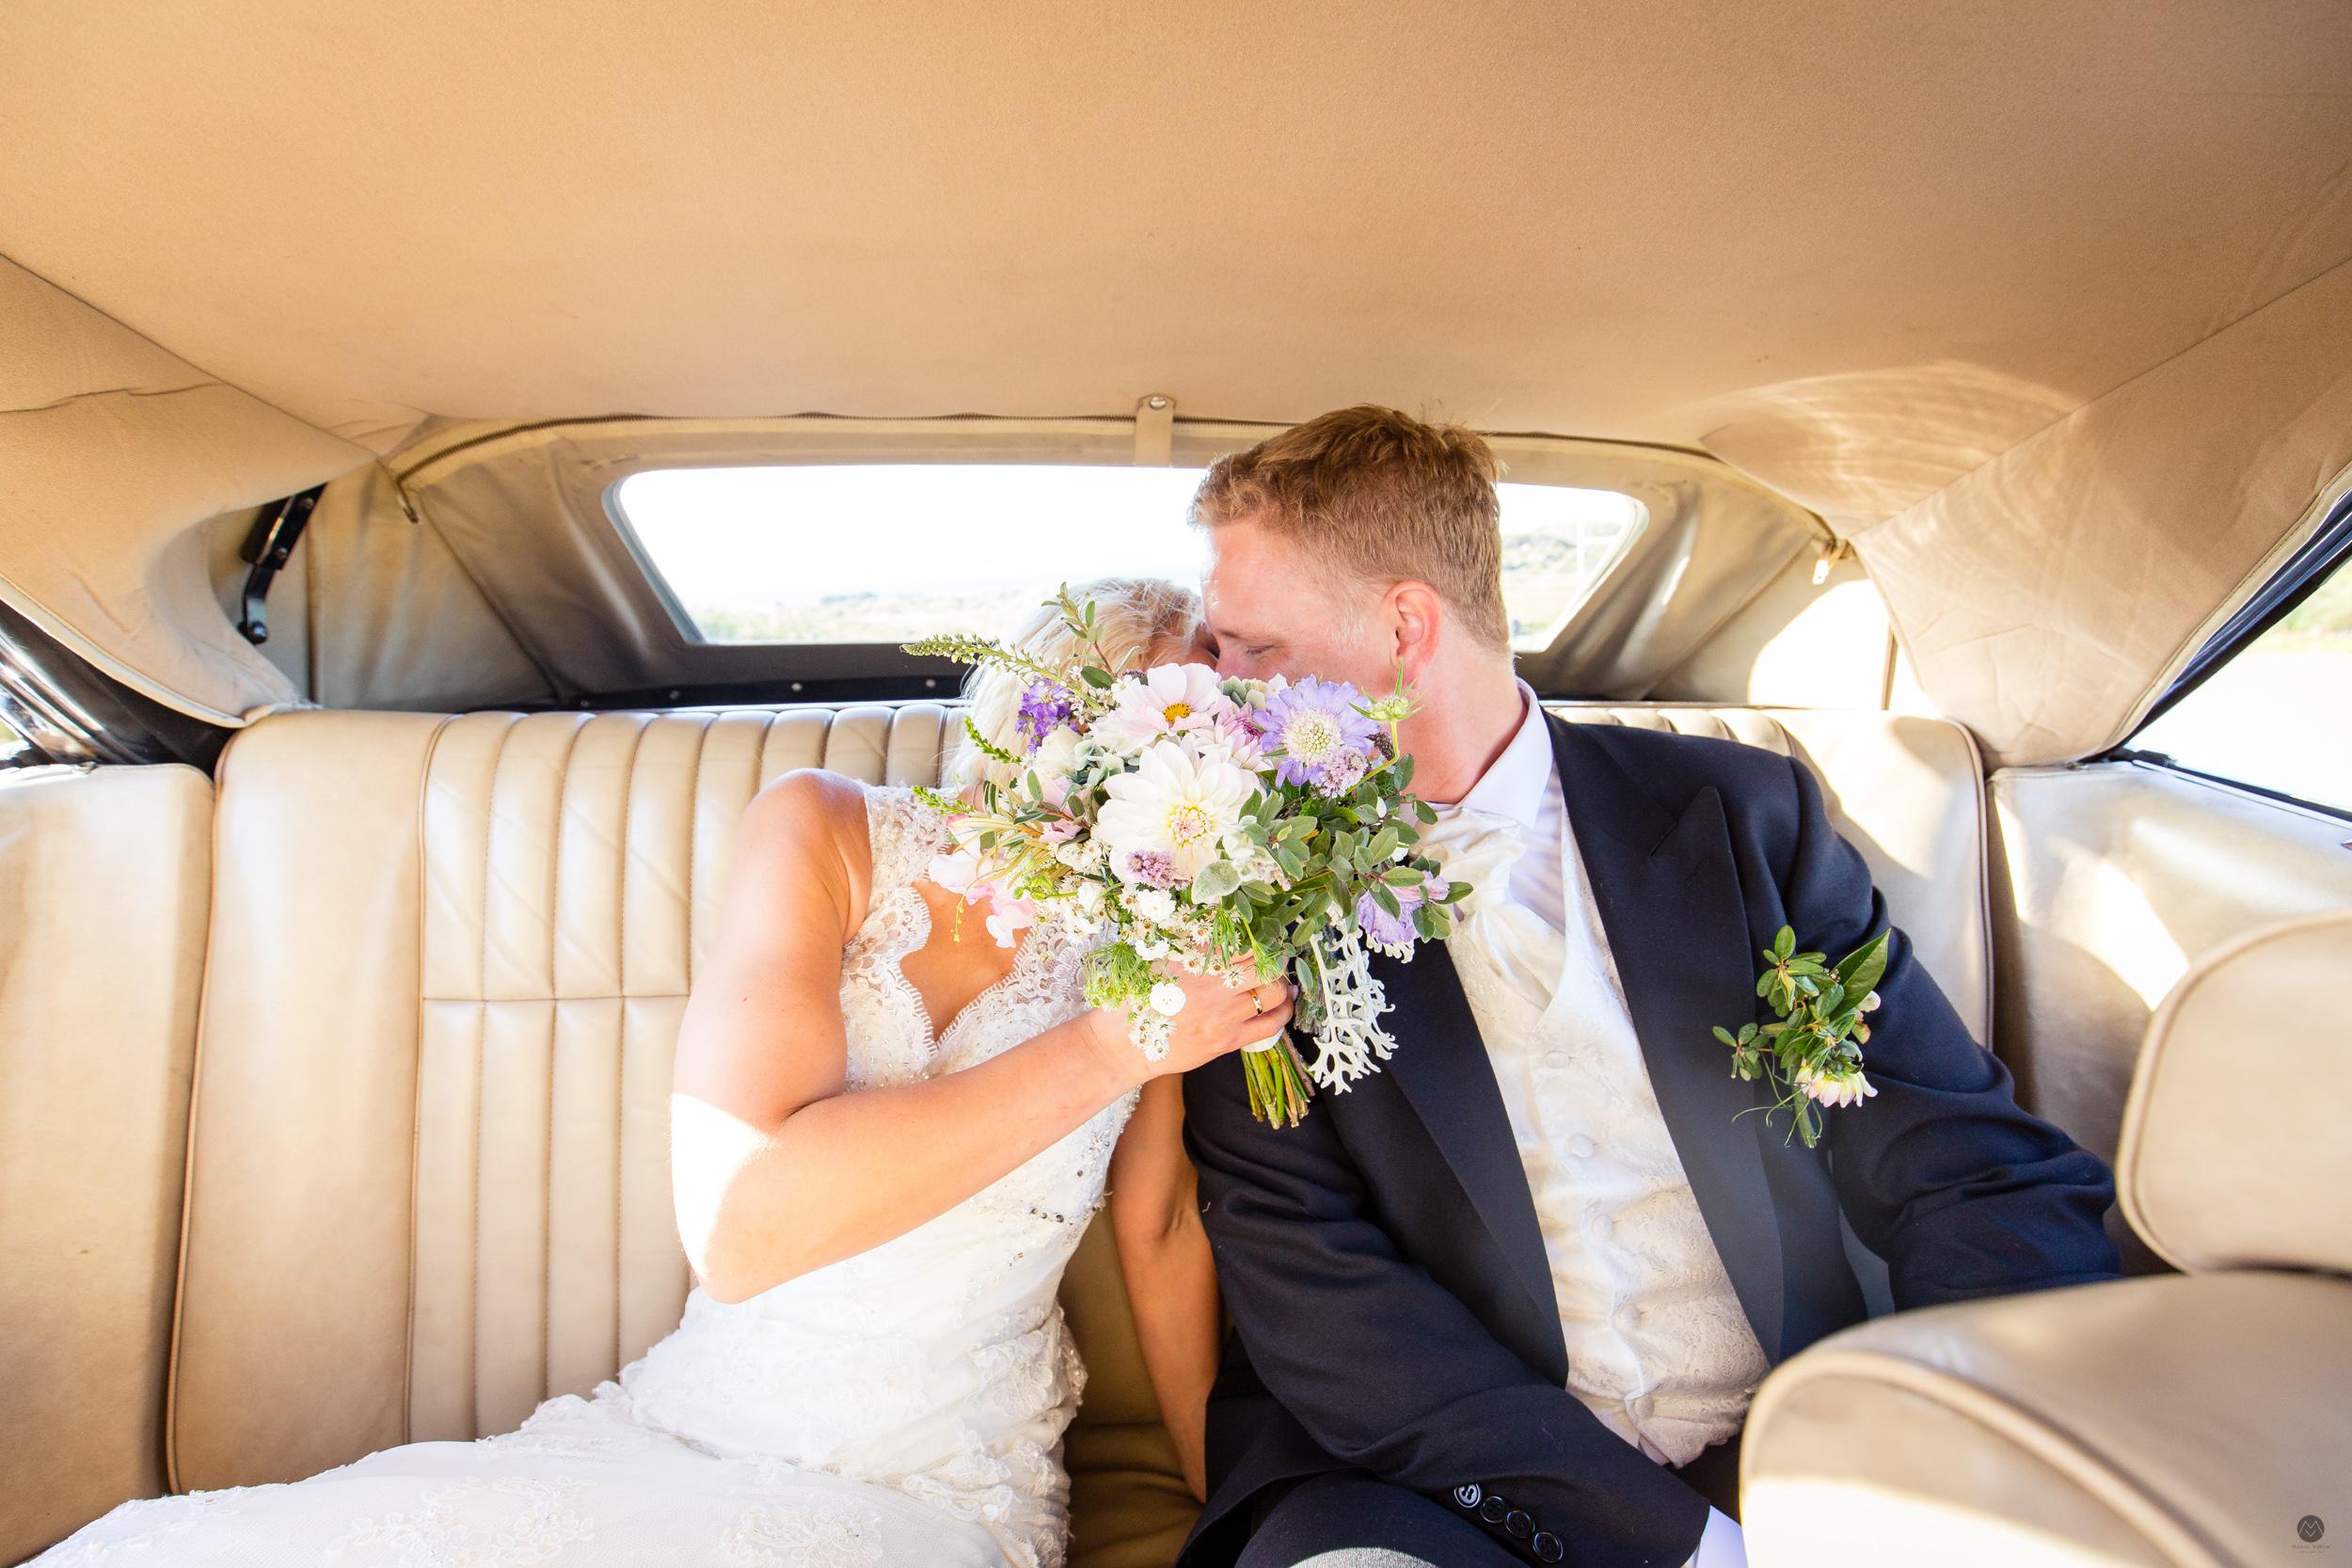 Bryllupsfotografering - Prispakker. Send forespørsel for gode tilbud.